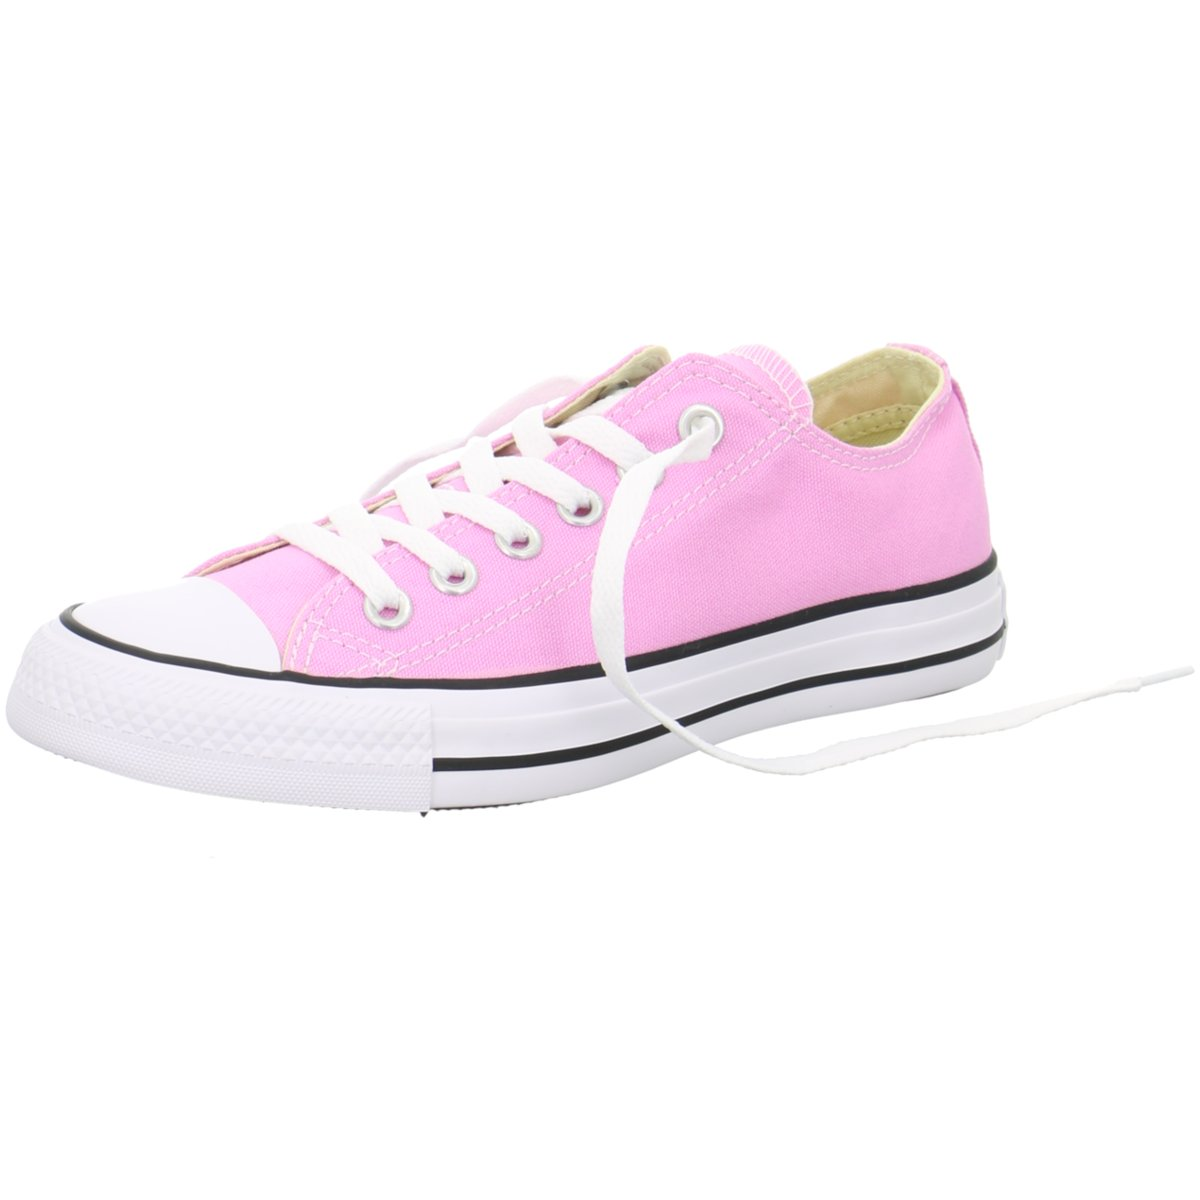 NEU Converse Damen Sneaker Sneaker Low CT BS OX 153875C rosa 173387